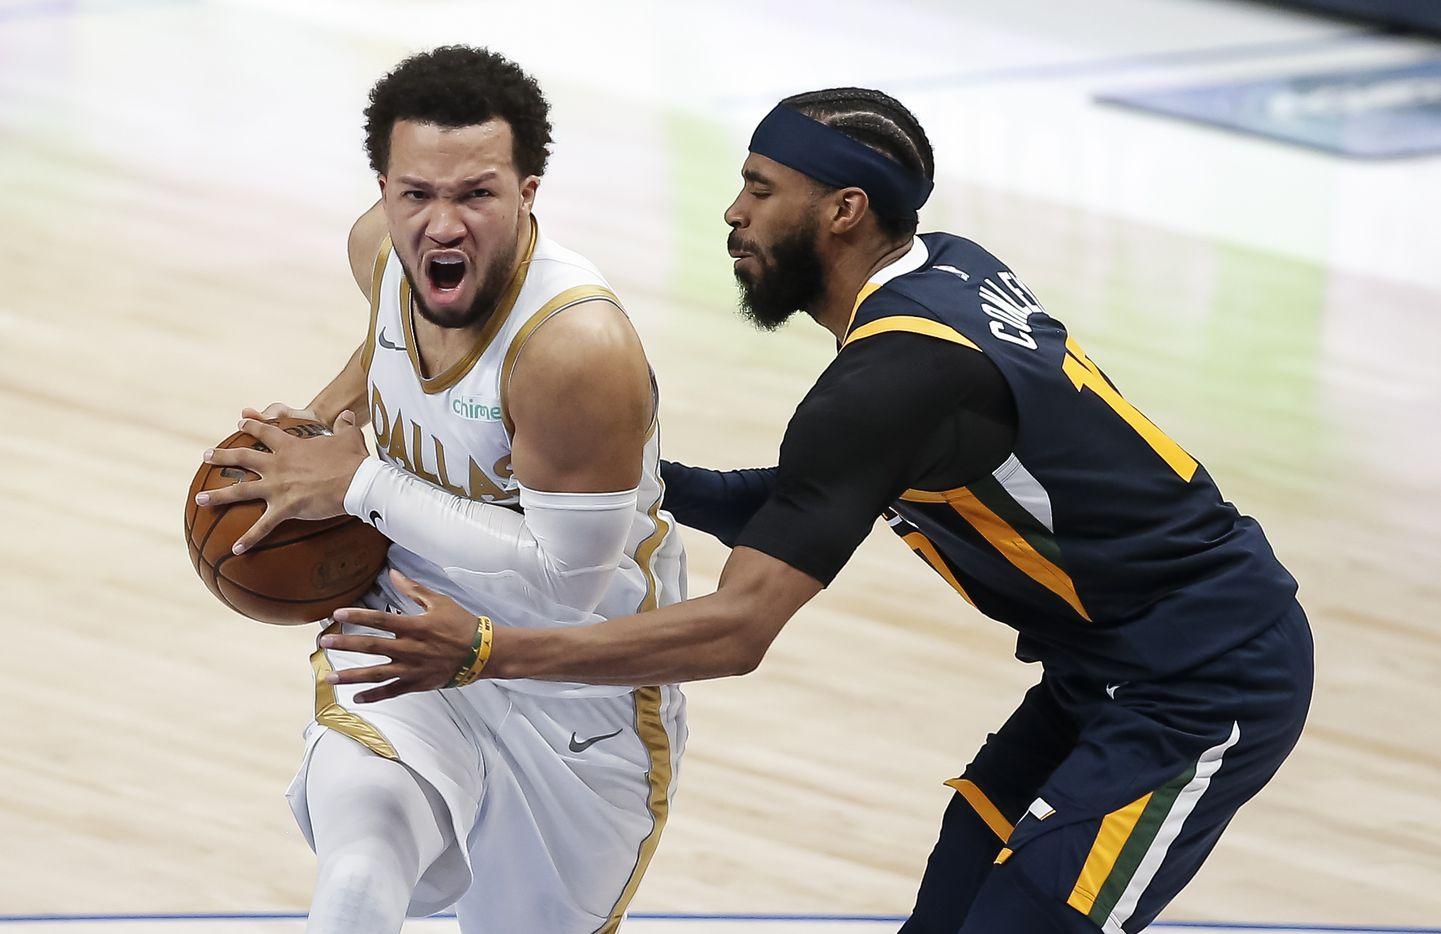 Dallas Mavericks guard Jalen Brunson (13) battles Utah Jazz guard Mike Conley (10) for space during the second half of an NBA basketball game in Dallas, Monday, April 5, 2021. Dallas won 111-103. (Brandon Wade/Special Contributor)